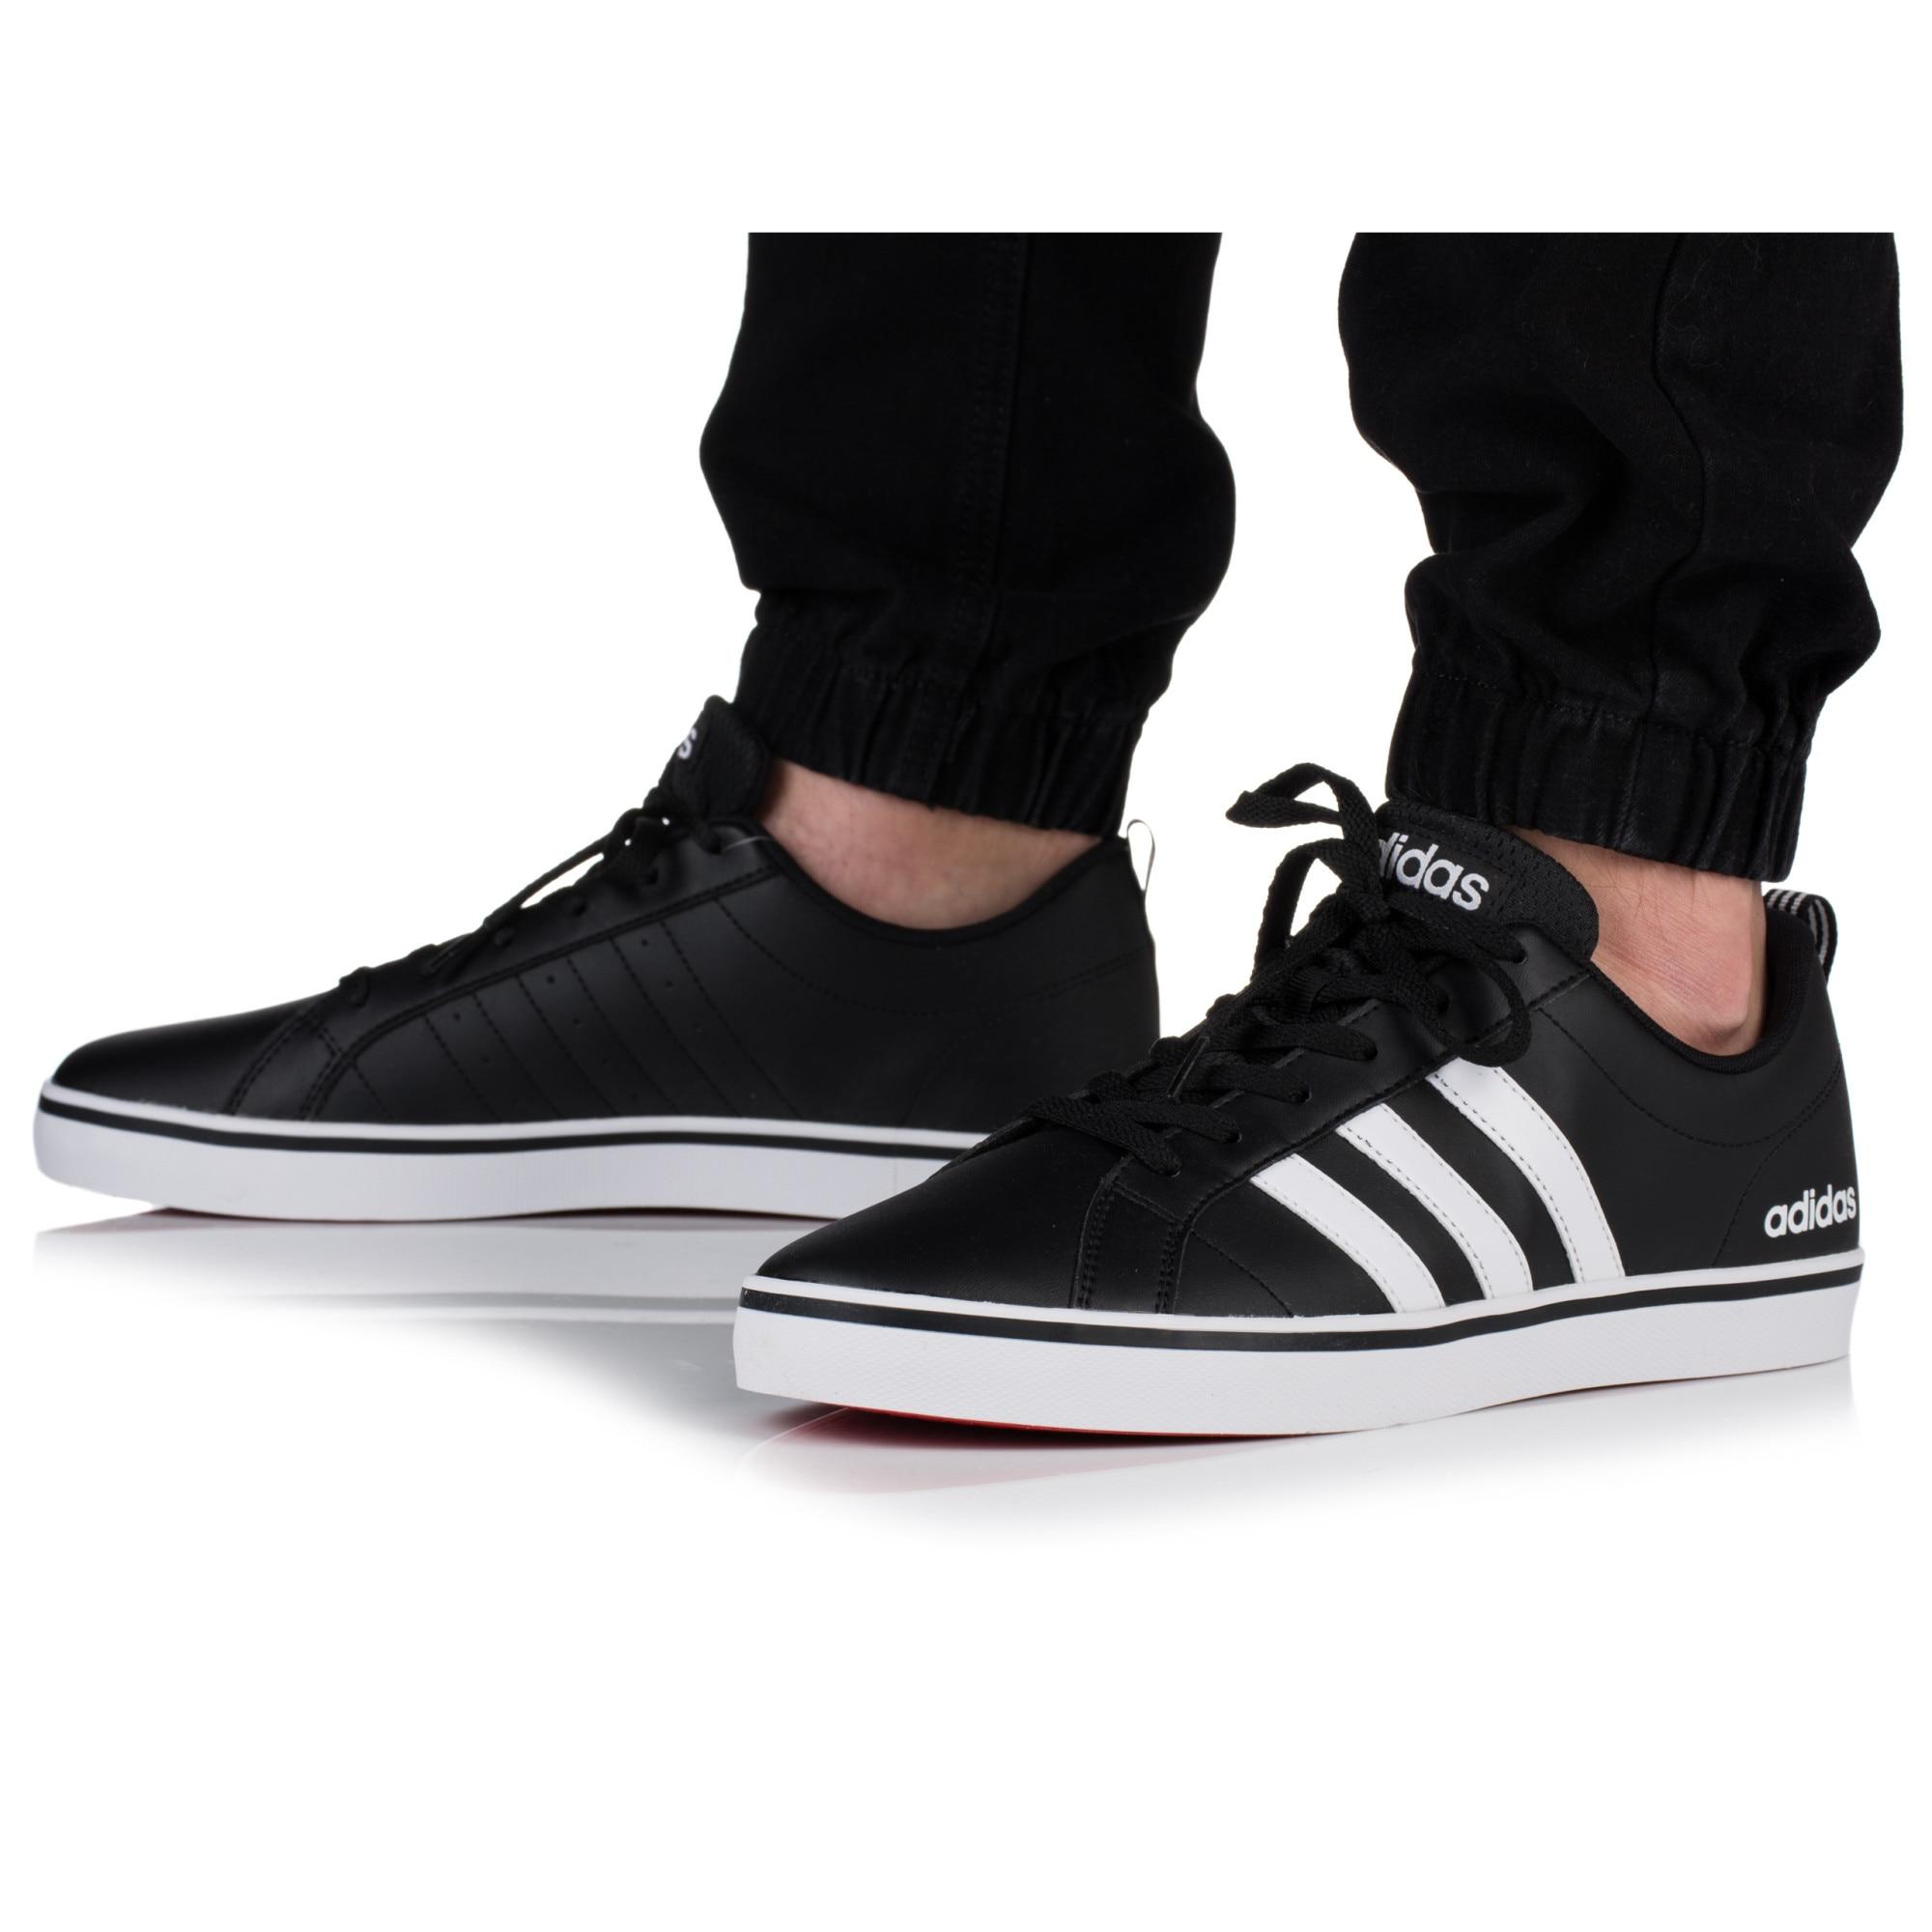 Buty Adidas Vs Pace B74494 44 23